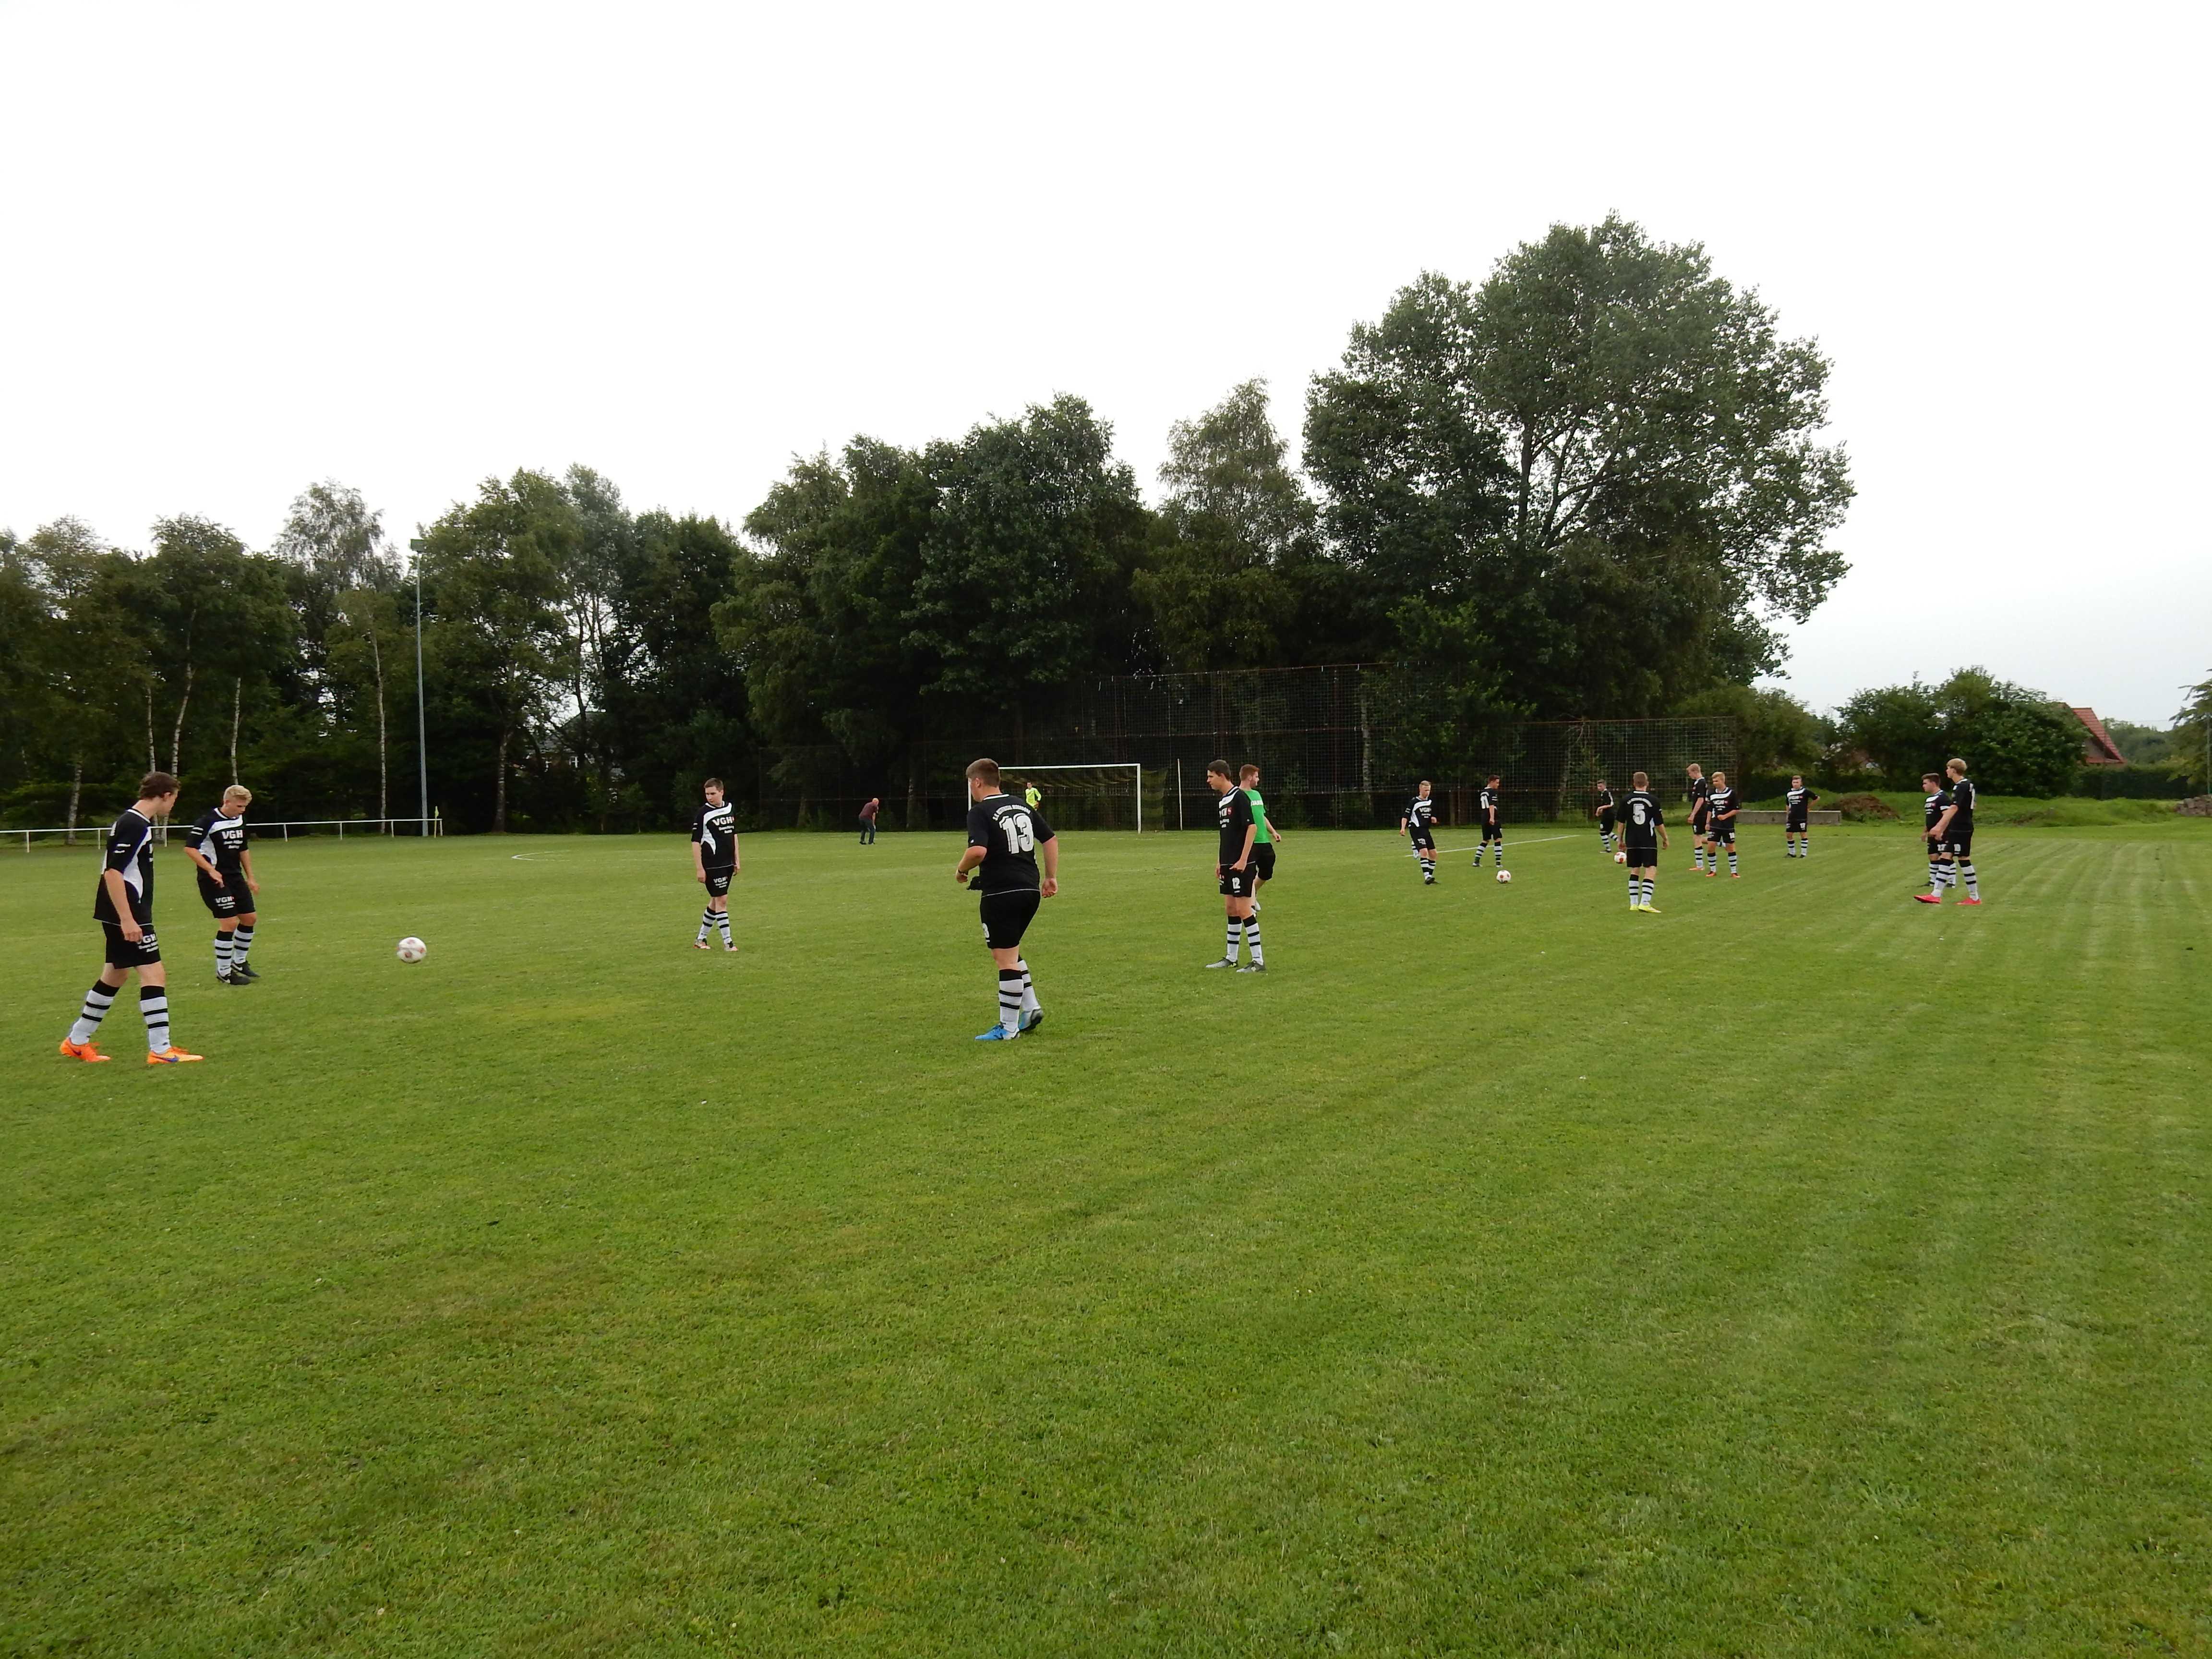 2016-07-28 Sportwoche - erster Donnerstag (15)